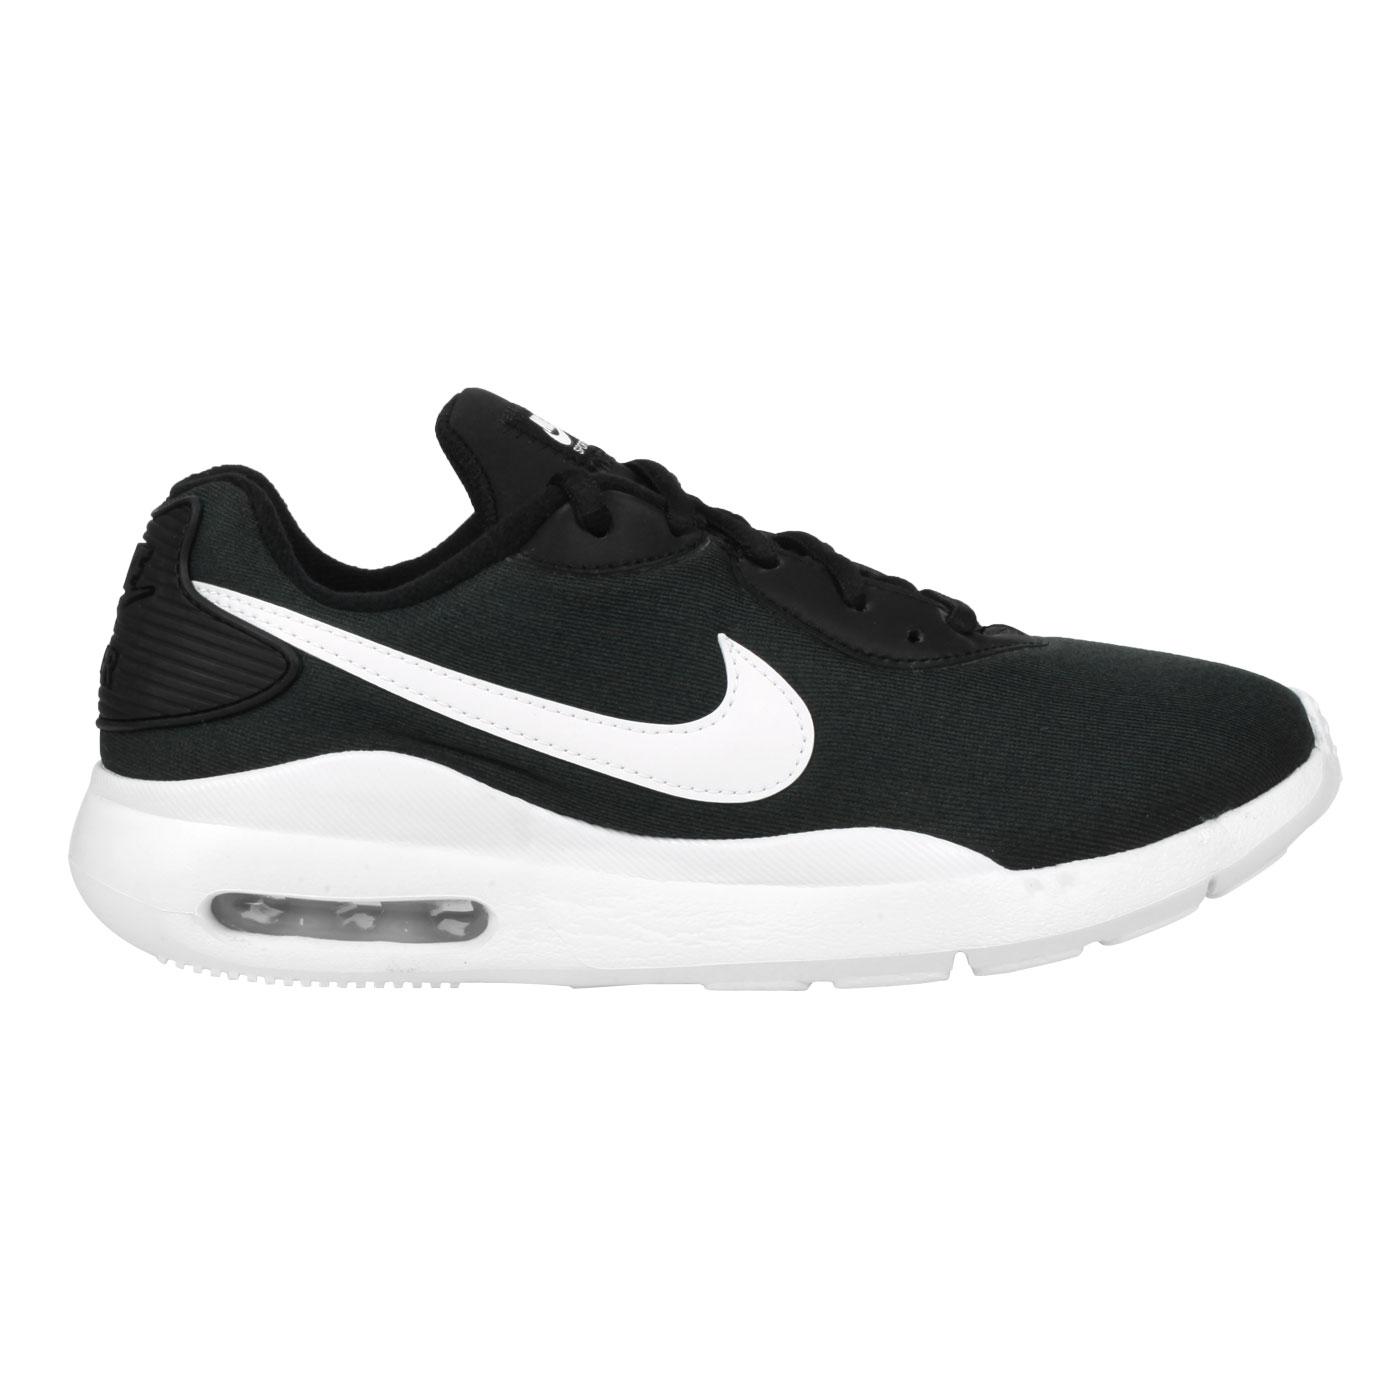 NIKE 女款休閒慢跑鞋  @WMNS  AIR MAX OKETO WNTR@CD5449001 - 墨綠黑白